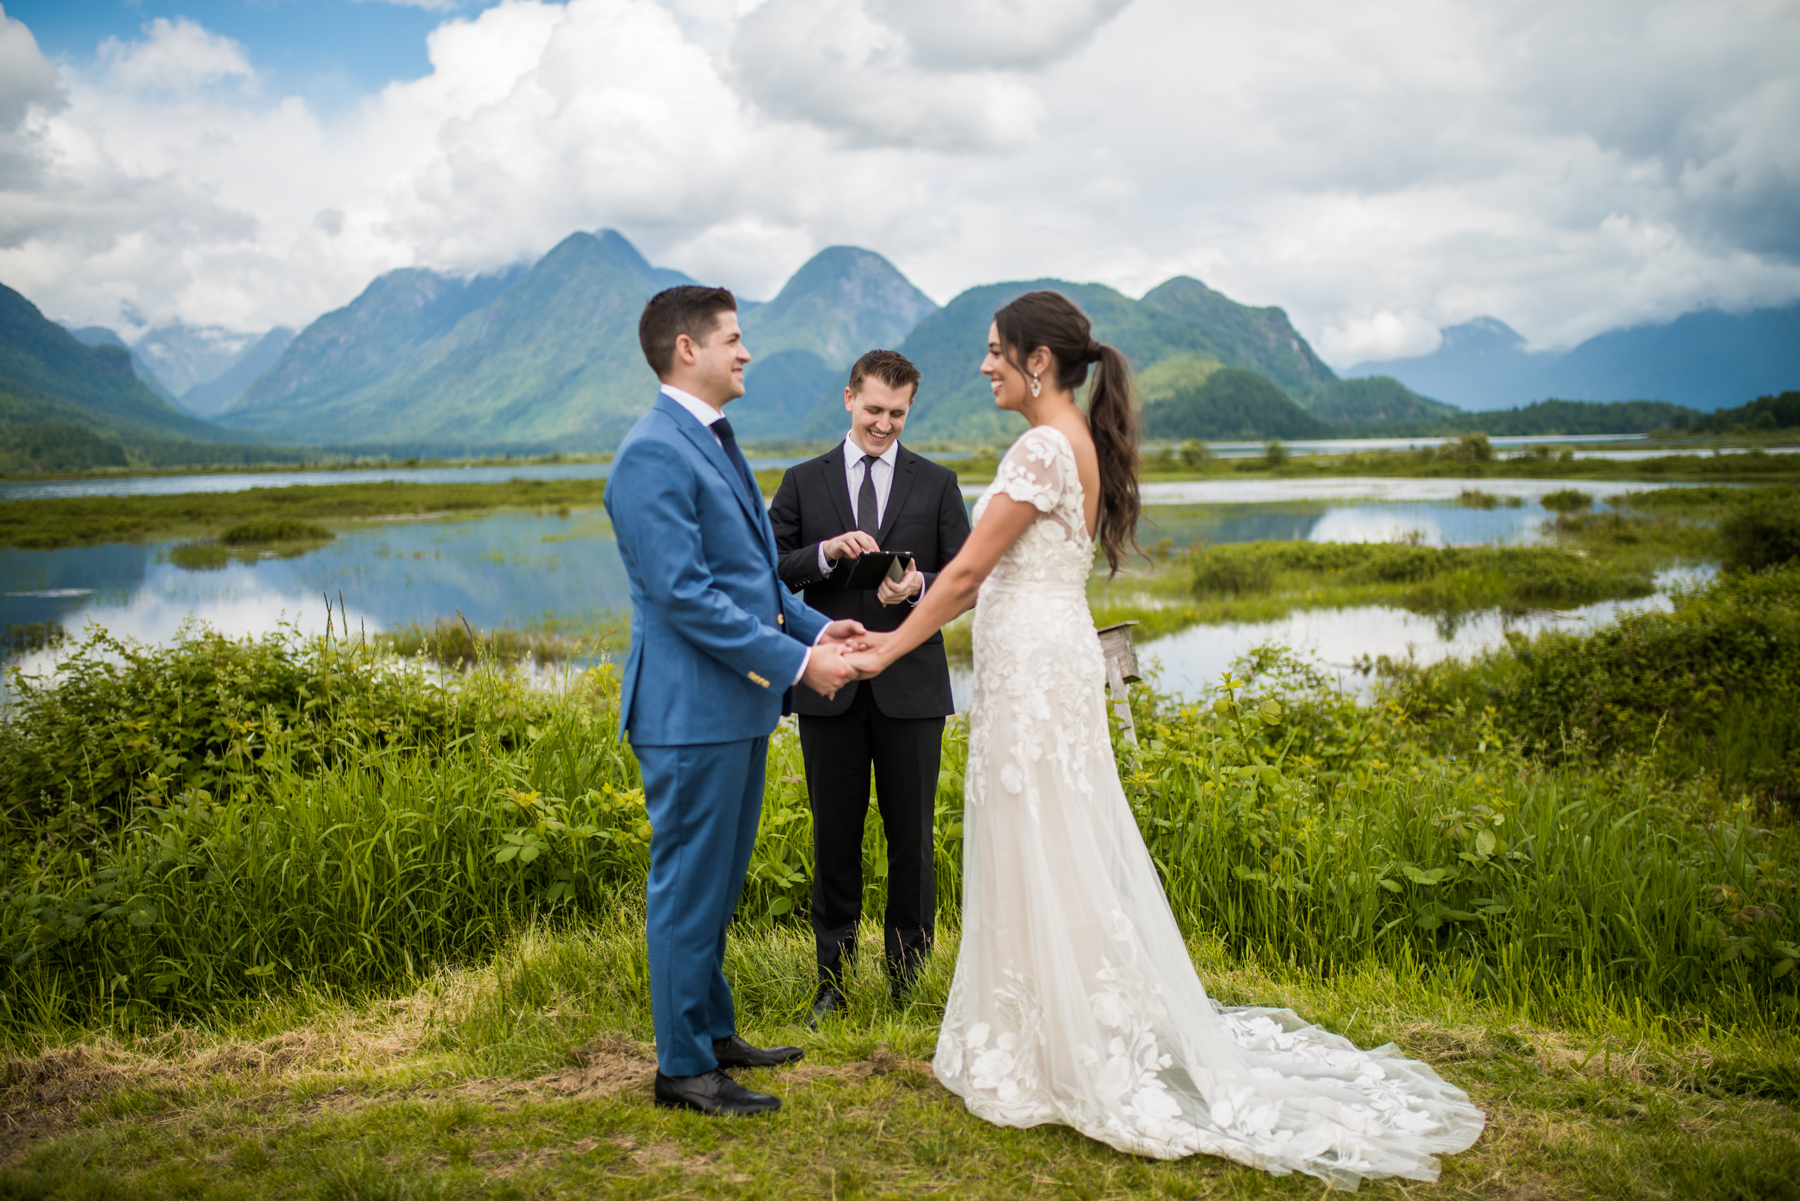 dp-wedding-web-046